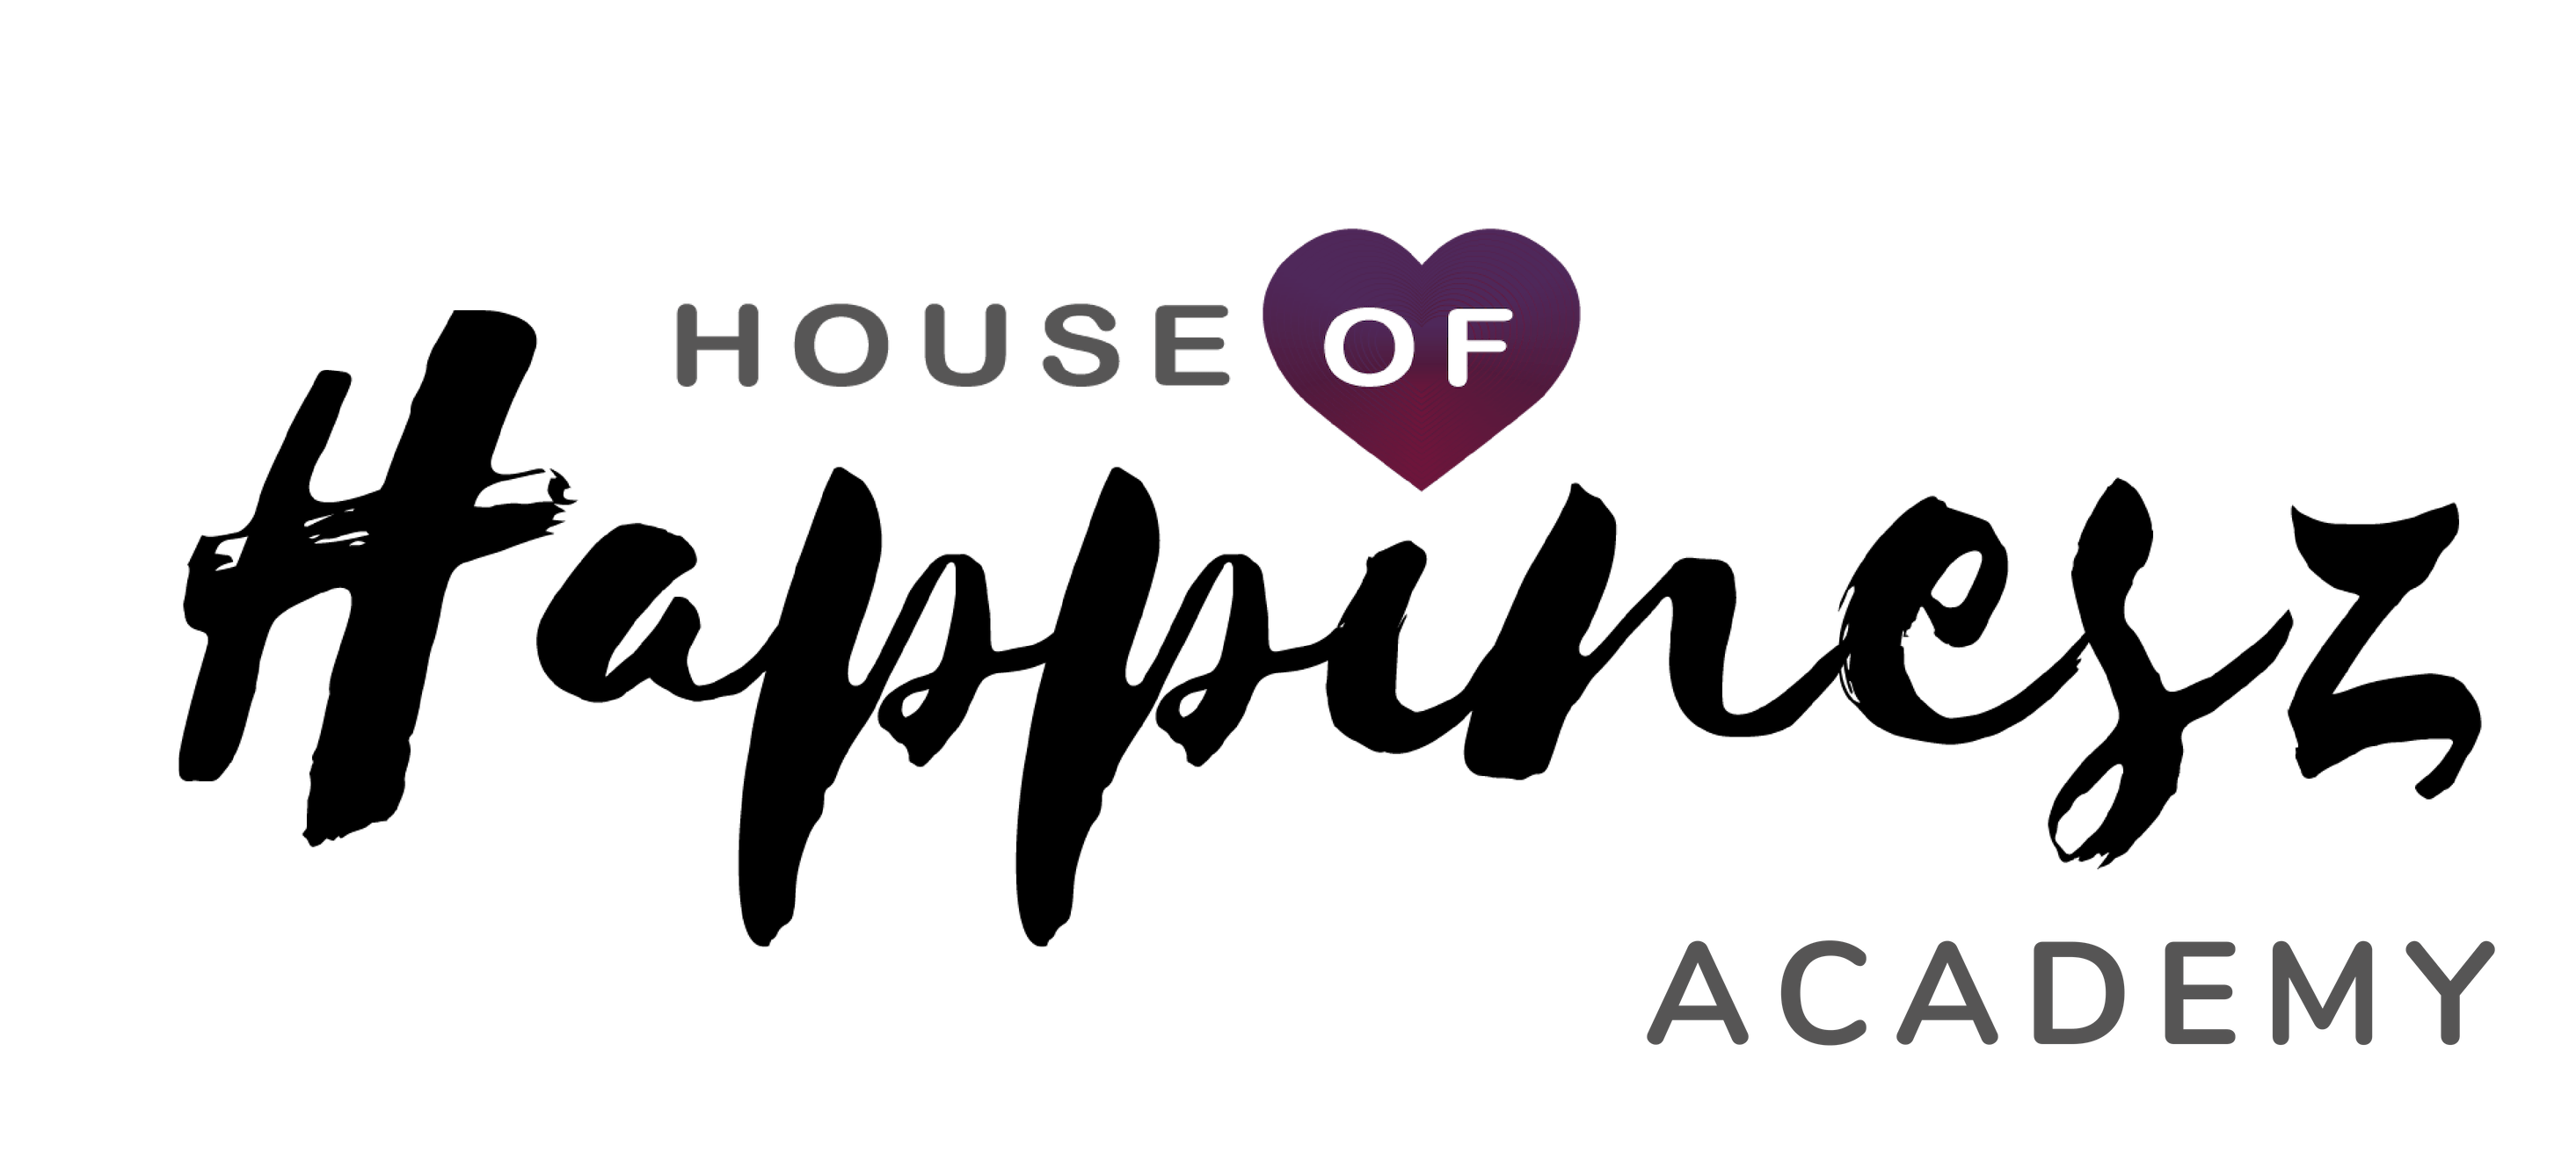 House of Happinesz Academy